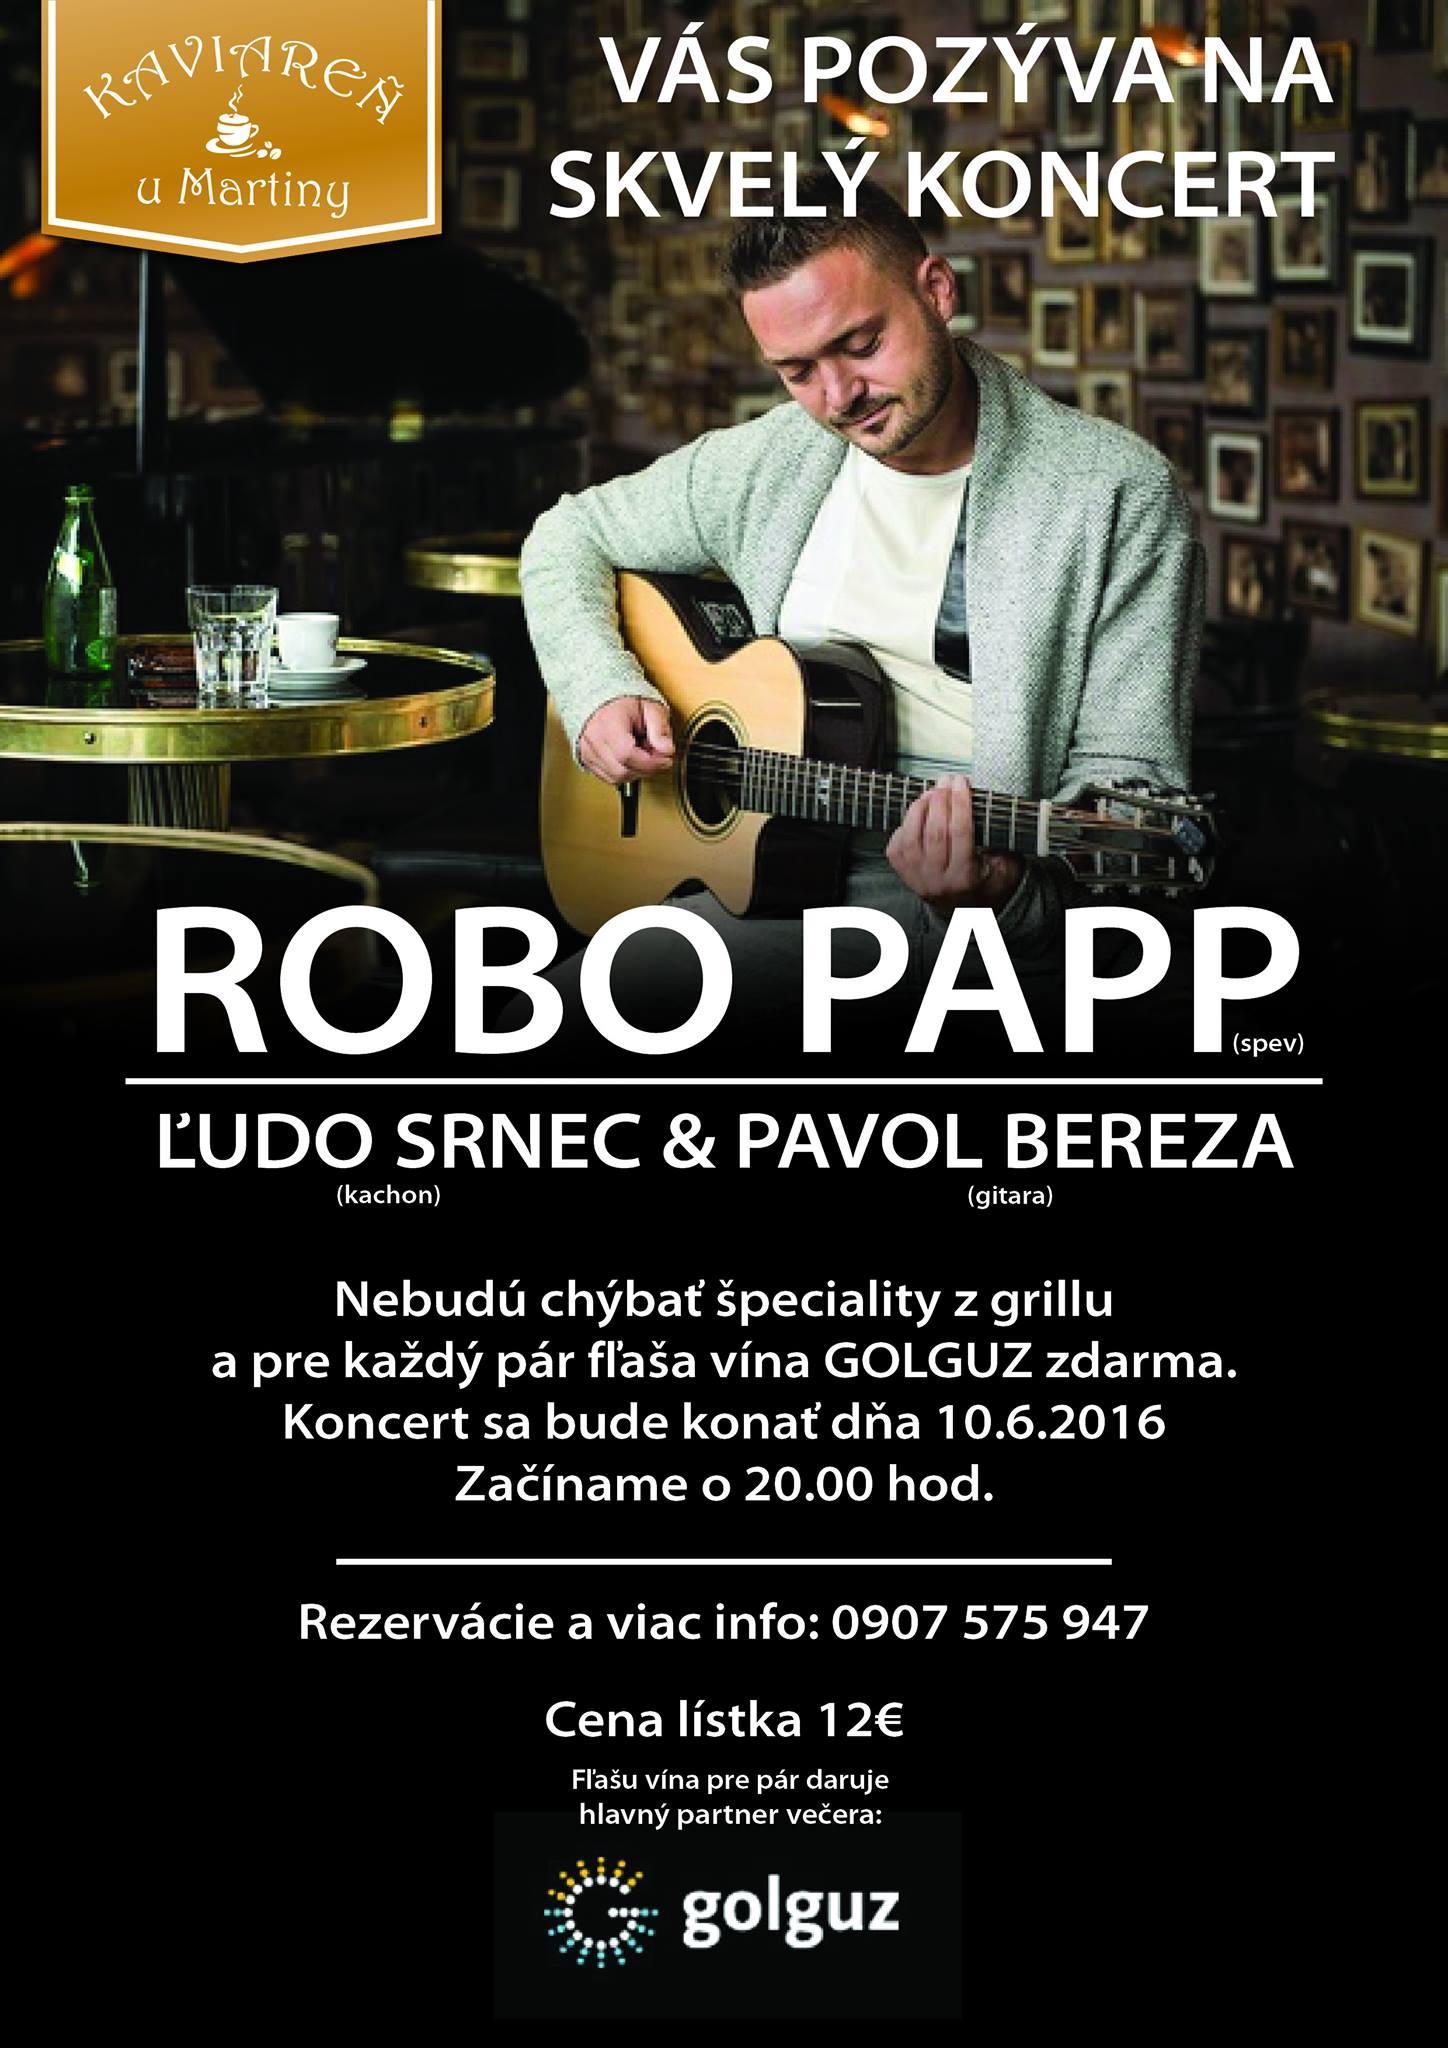 ROBO PAPP, Ľubo Srnec & Pavol Bereza